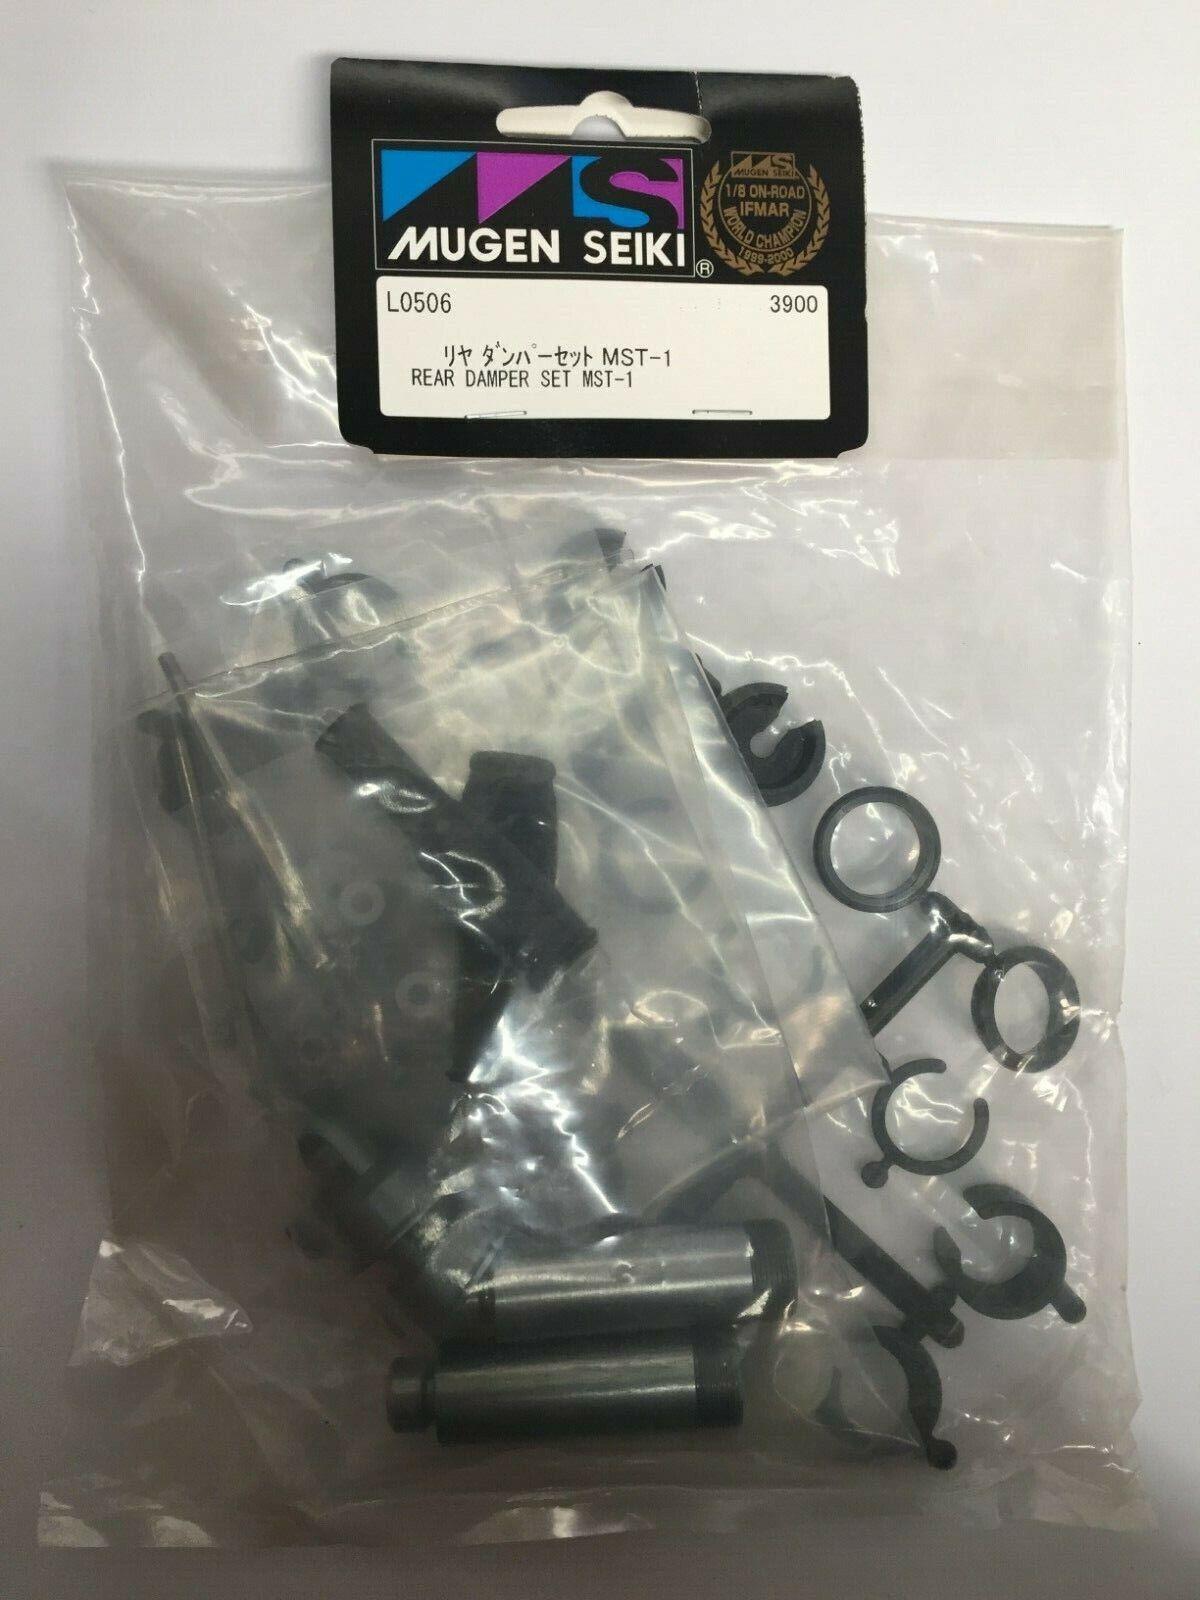 Vintage Mugen Seiki Seiki Seiki L0506 Rear Damper Set MST-1 680ec6